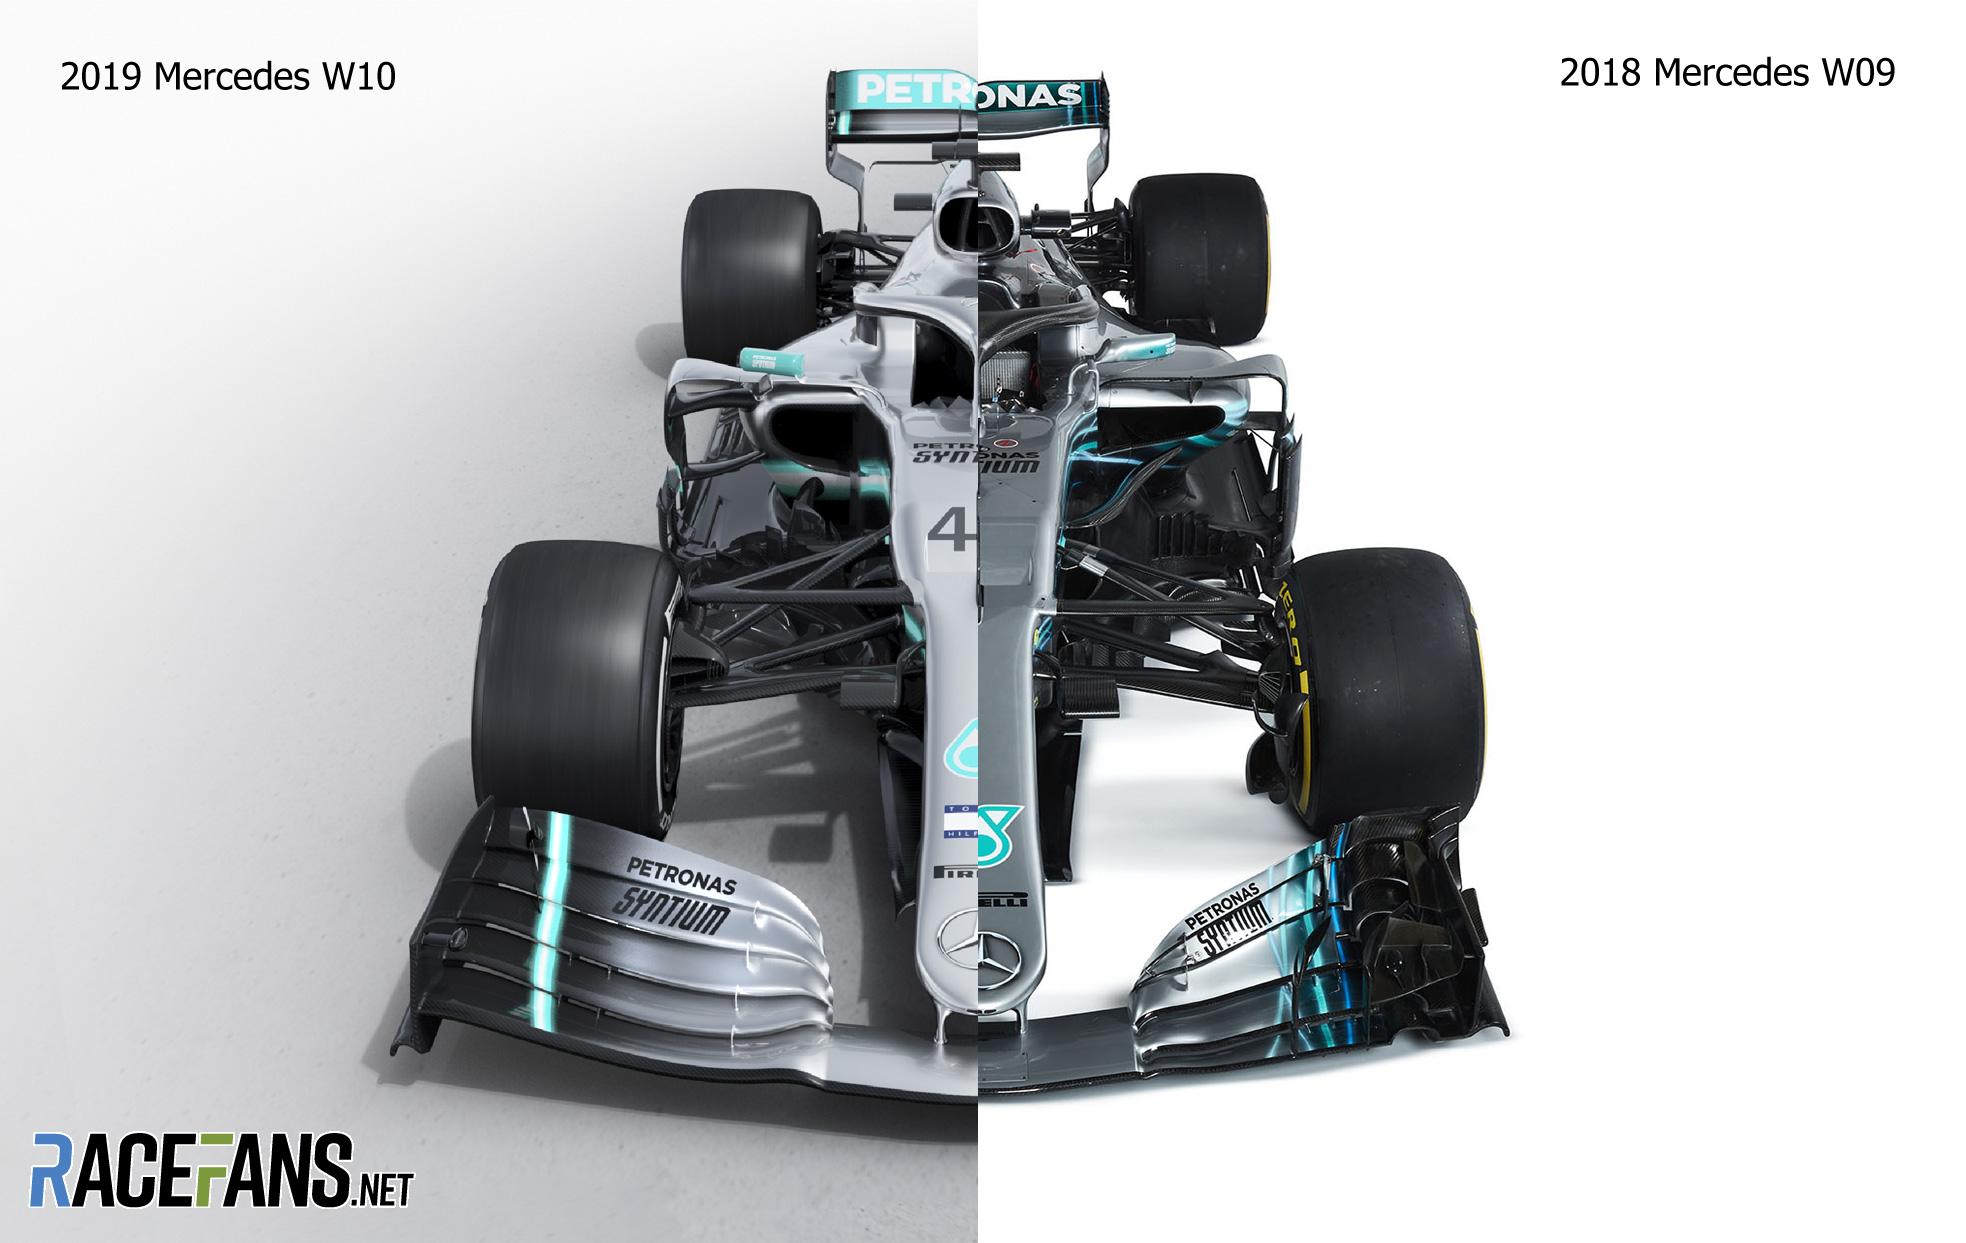 merc-compare.jpg